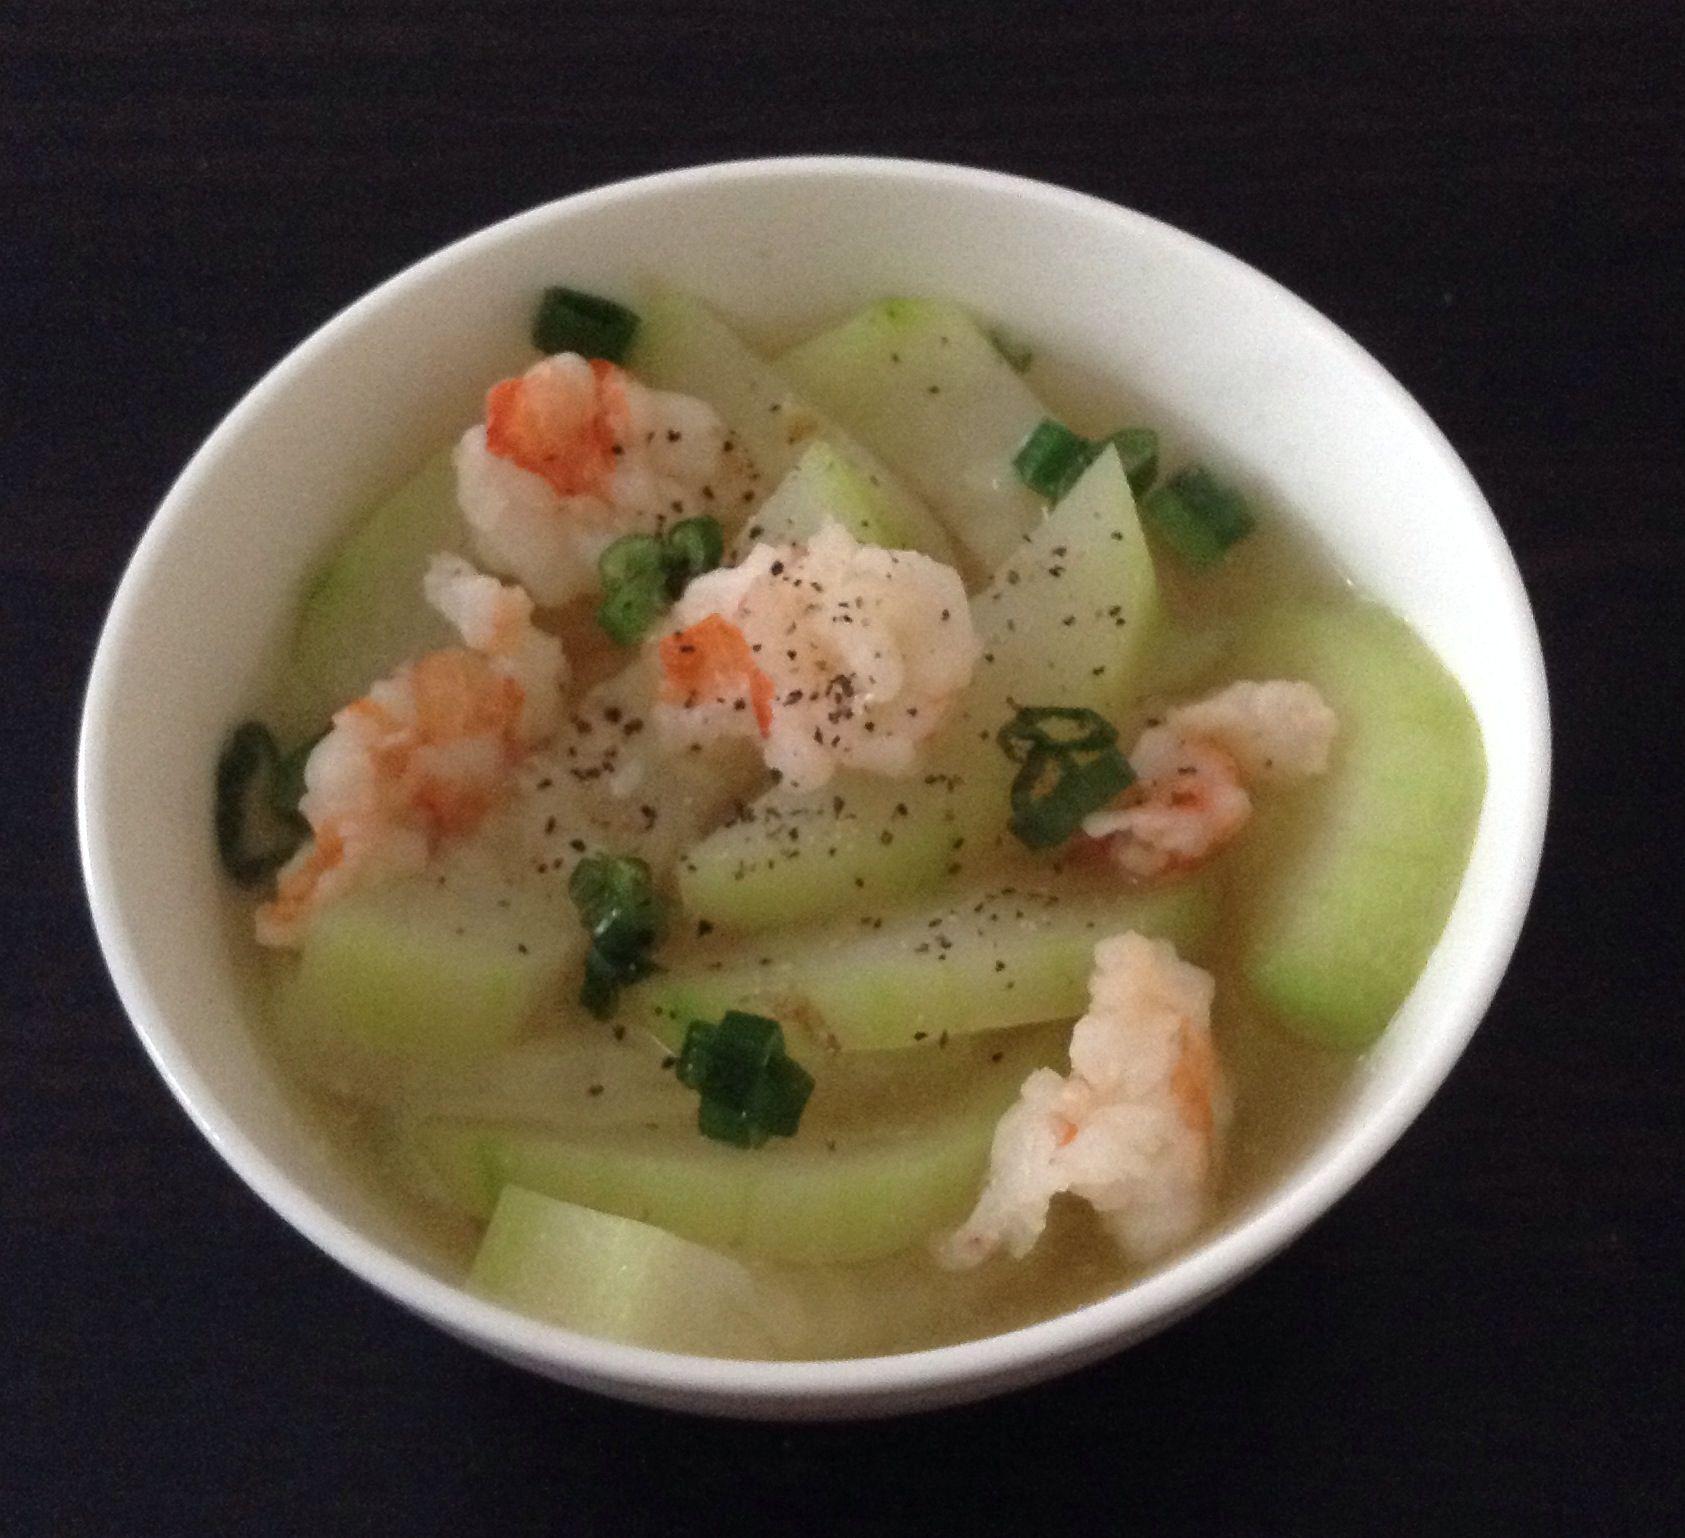 Vietnamese Comfort Food >> Vietnamese Comfort Food Canh Bi Dau This Soup Always Warms My